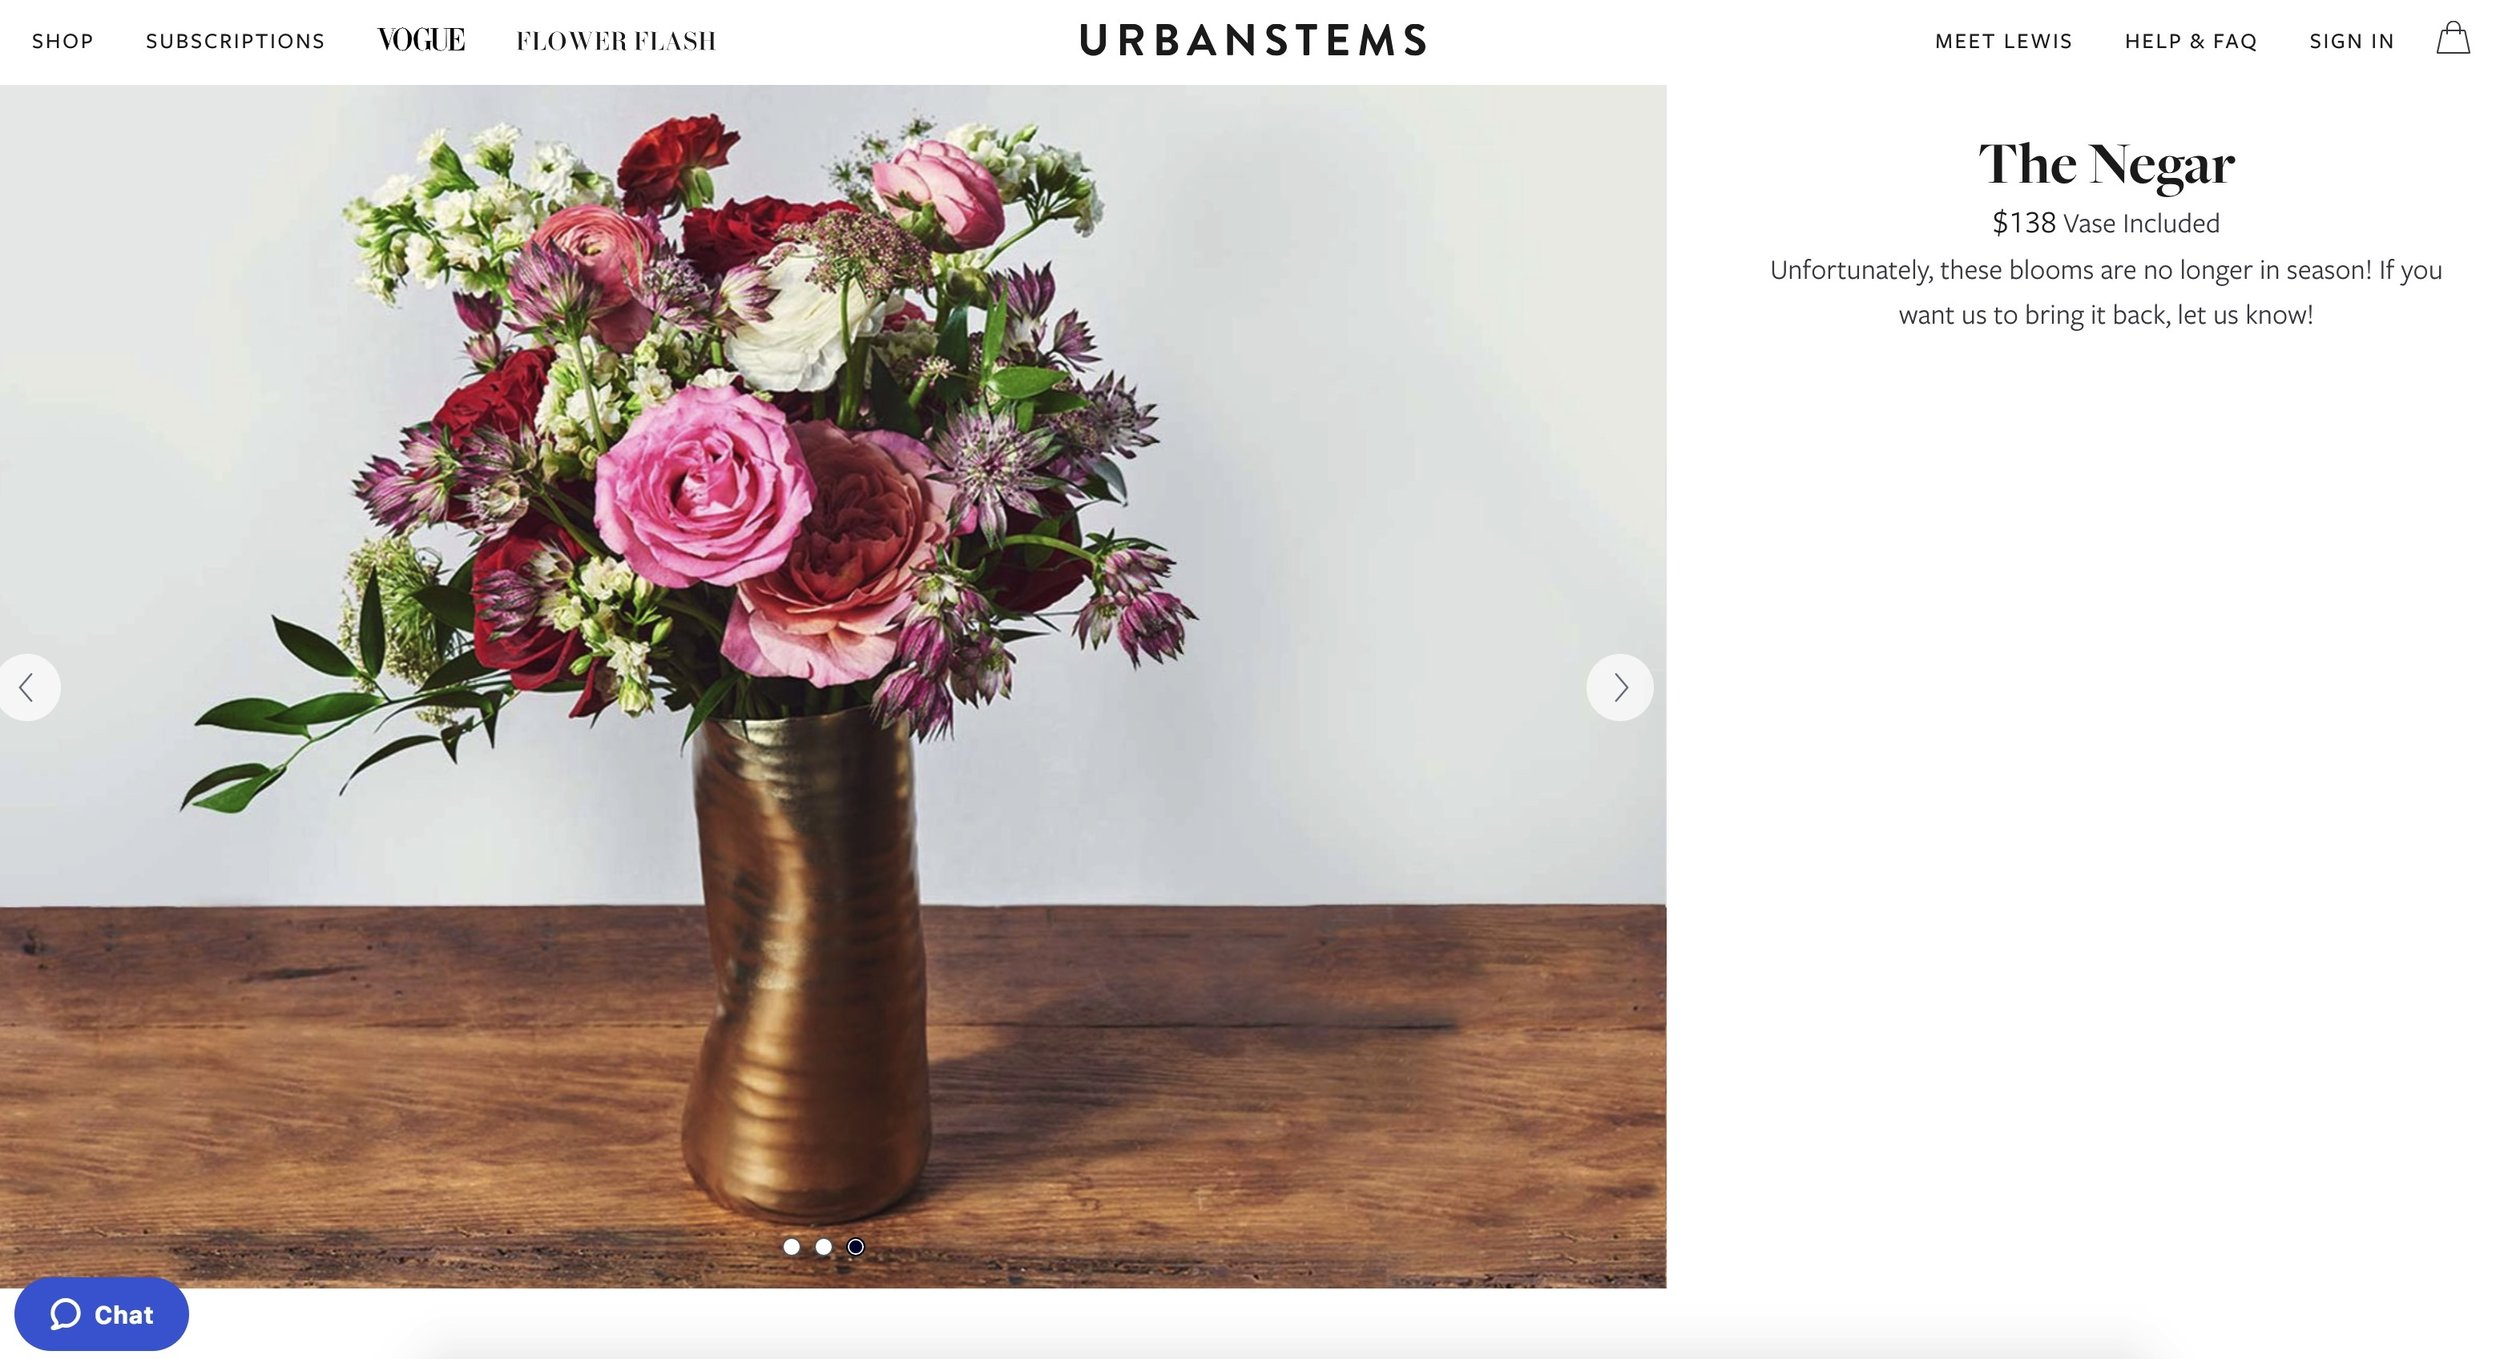 The Negar Arrangement from Vogue x Urbanstems.  Gorgeous, Bold and Modern!